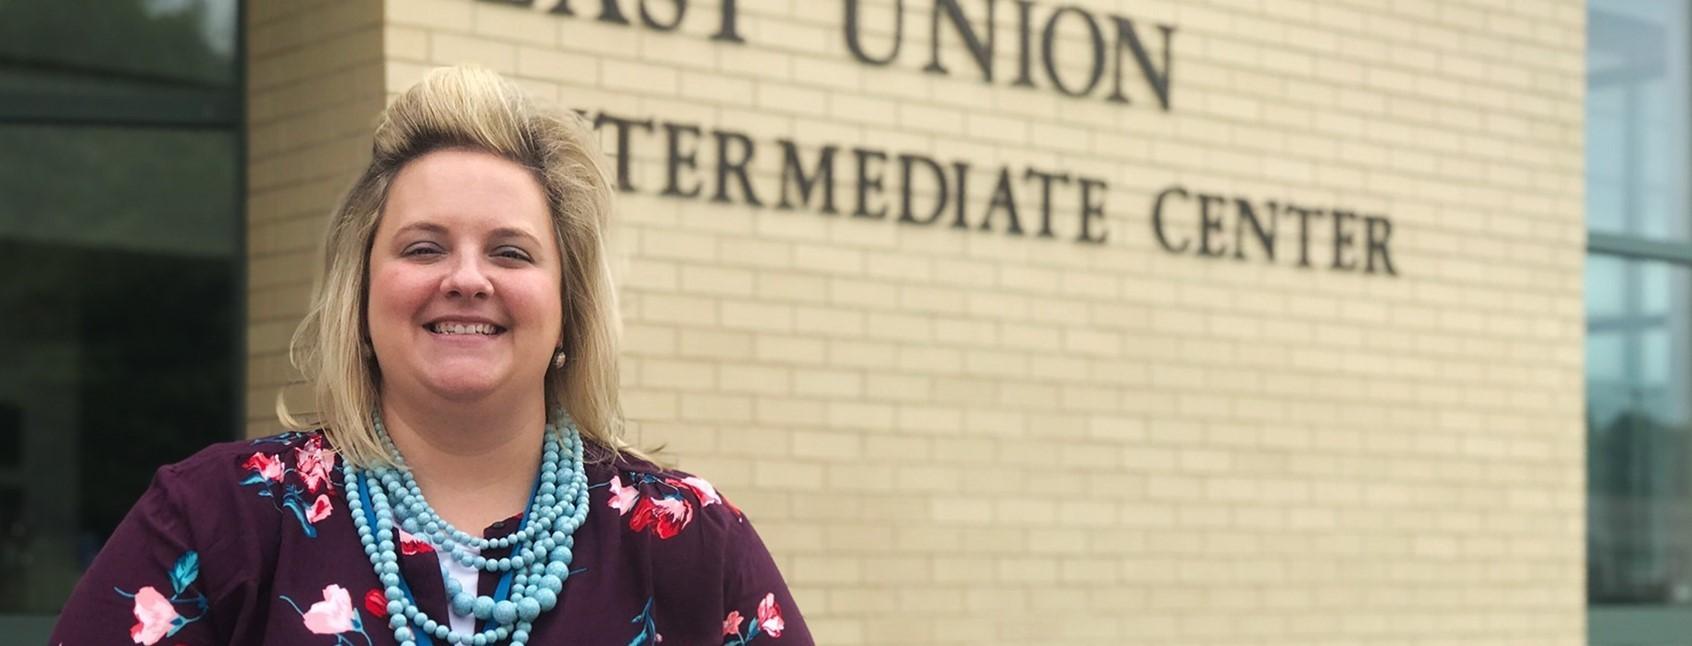 VanderSchaaff named acting principal at East Union Intermediate Center